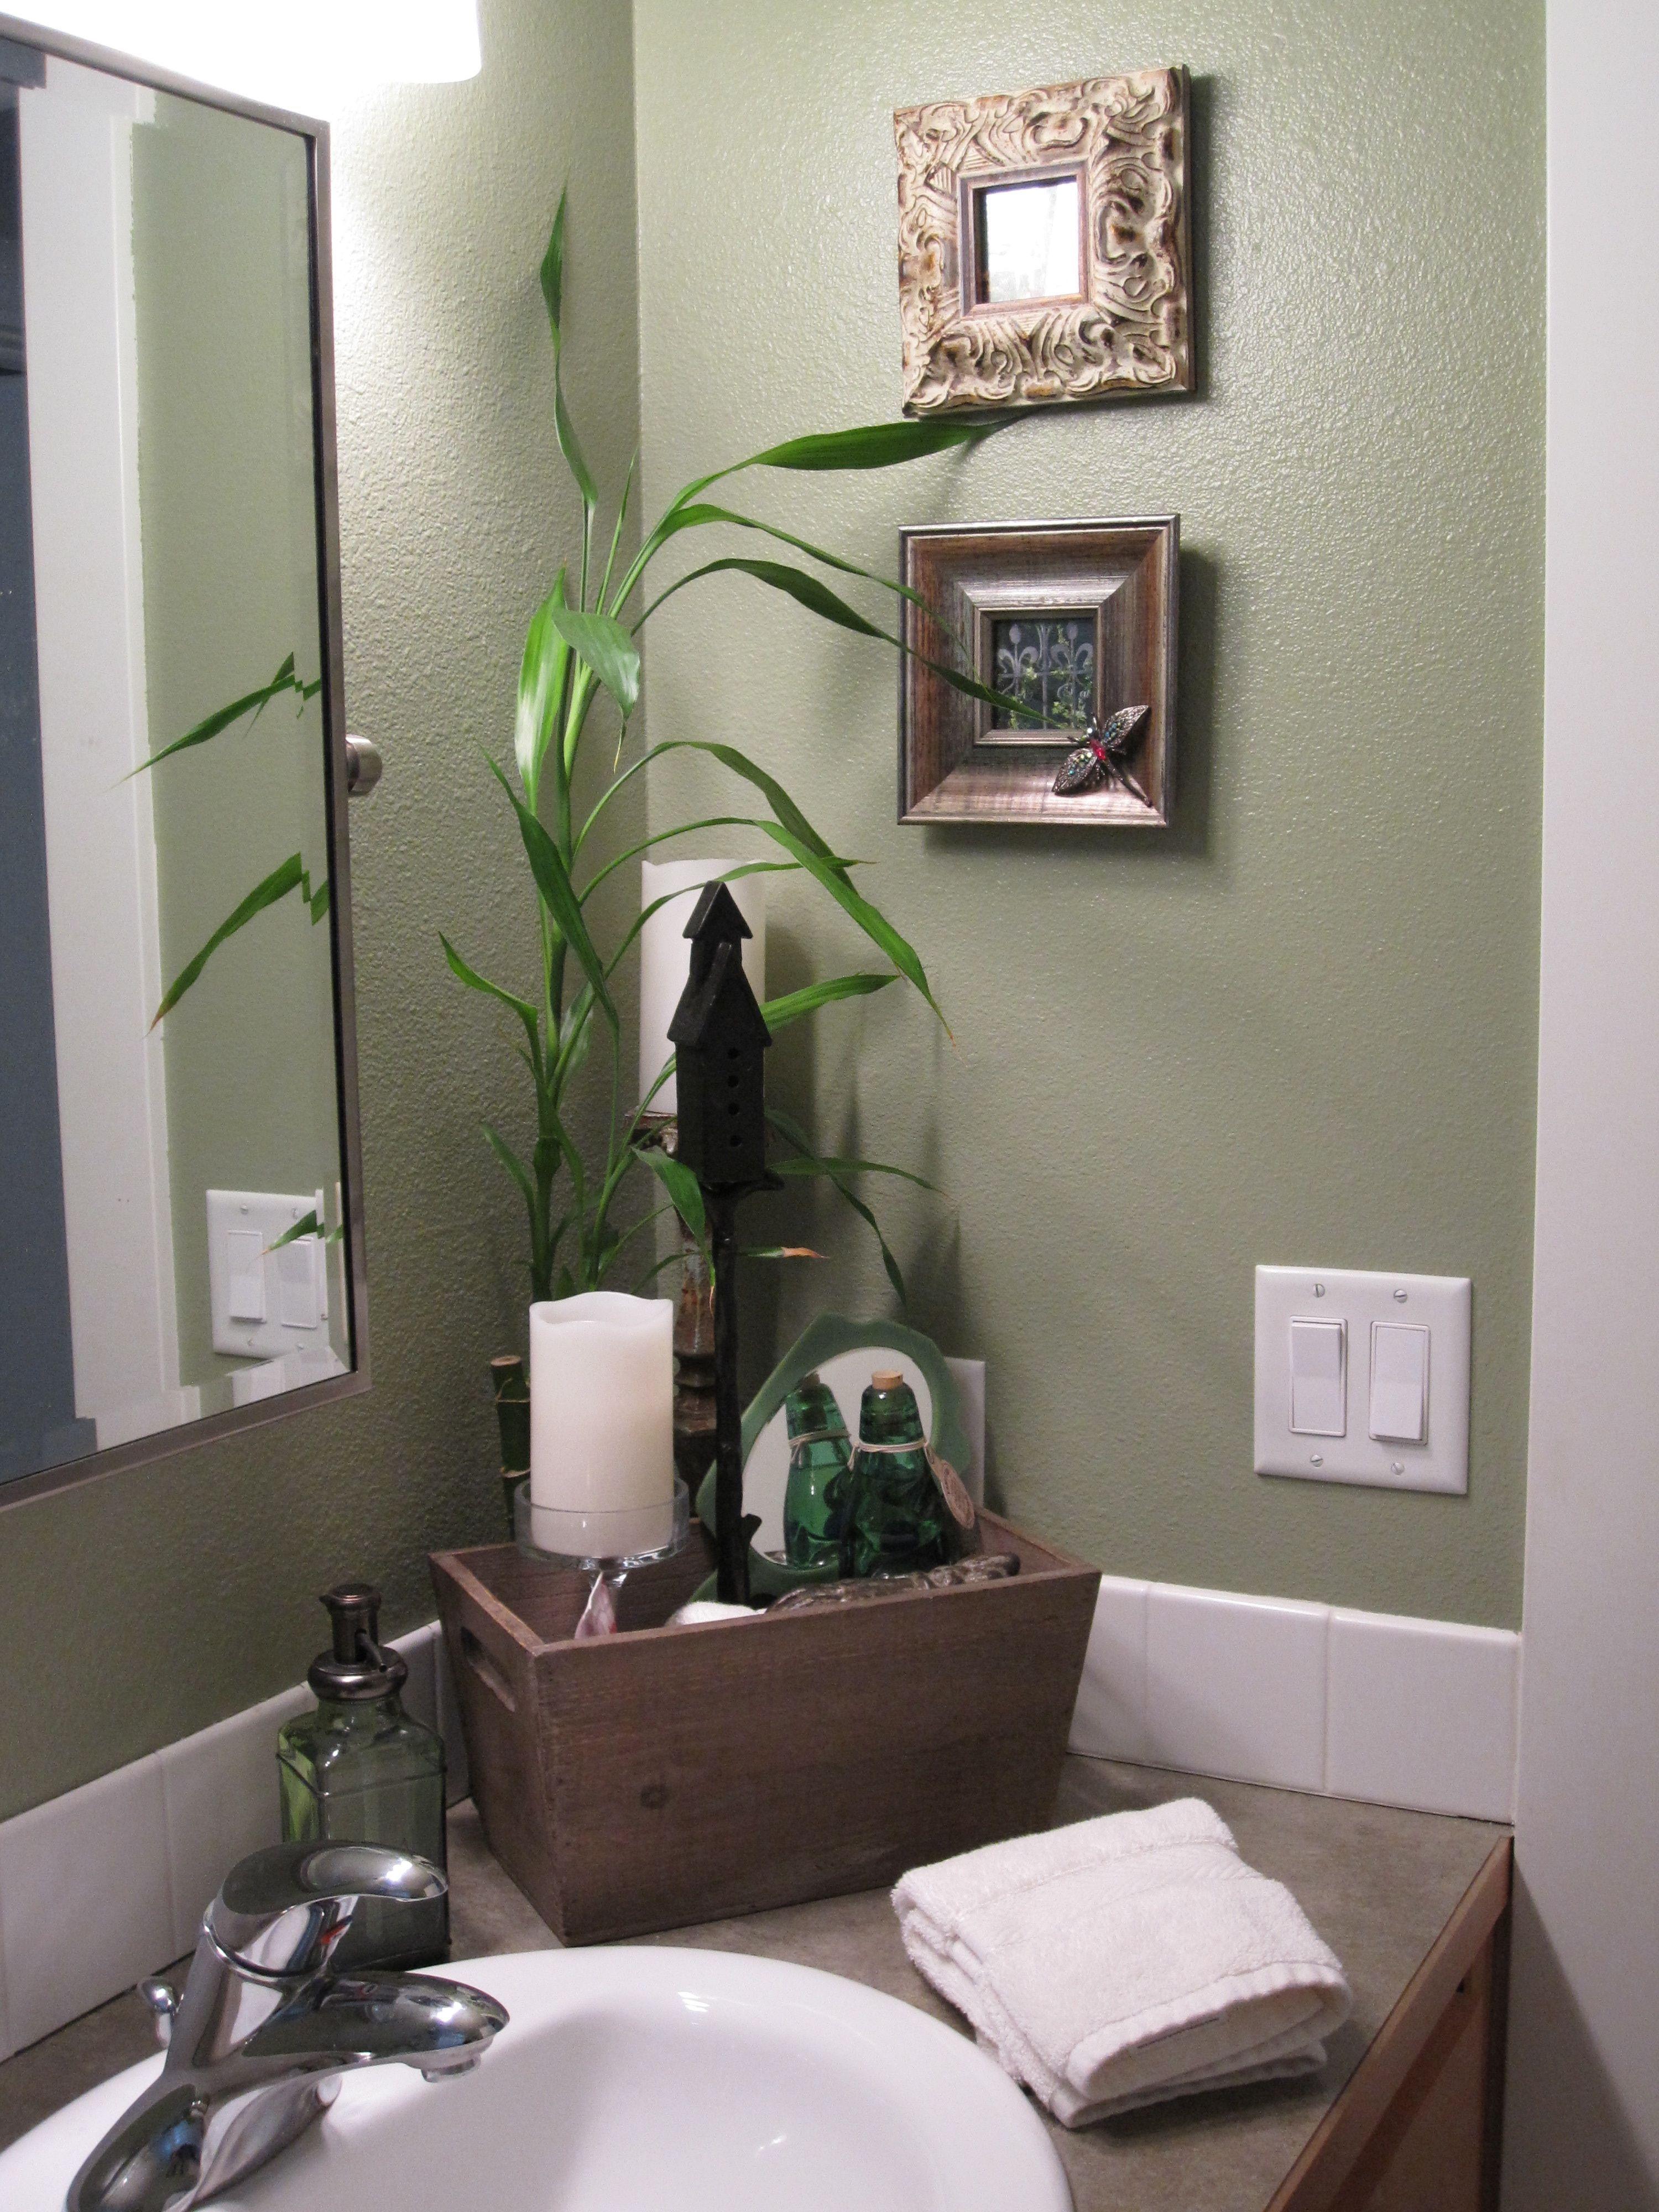 Graue Badezimmer Farbe Ideen Blau Badezimmer Farbe Badezimmer Farbe Trends Gross Graue Bade Green Bathroom Decor Bathroom Wall Colors Best Bathroom Colors